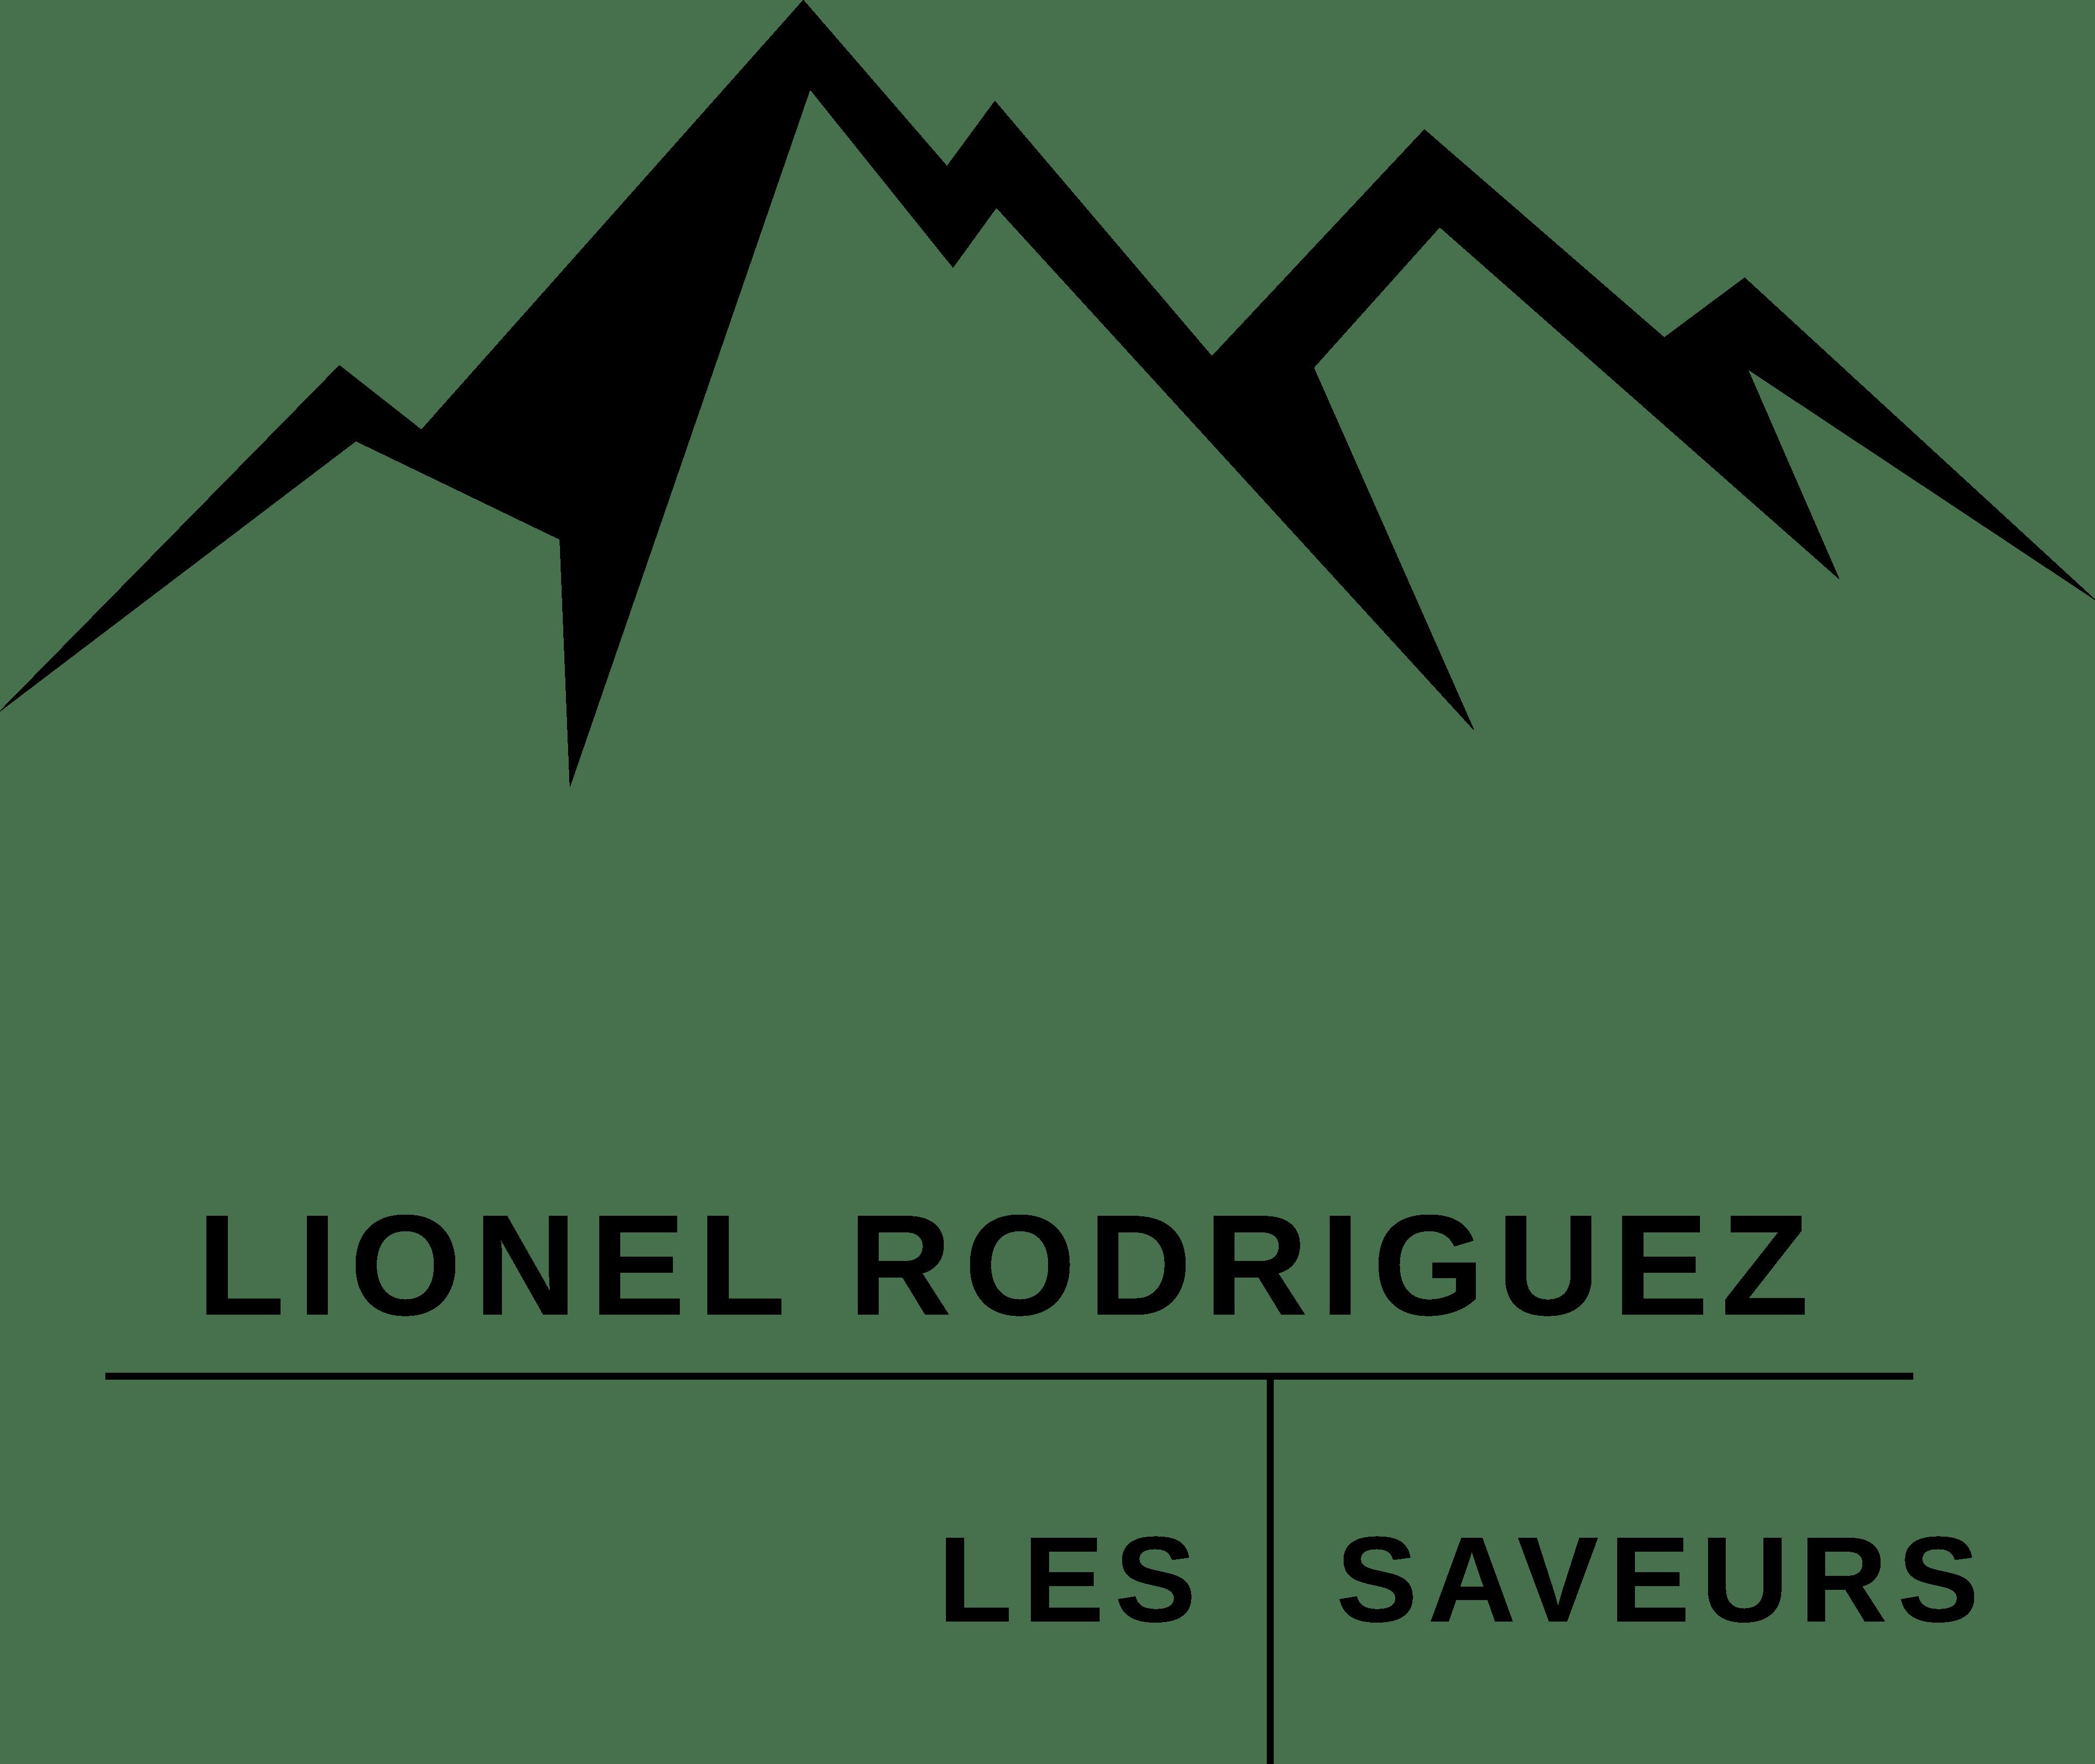 Chef Lionel Rodriguez